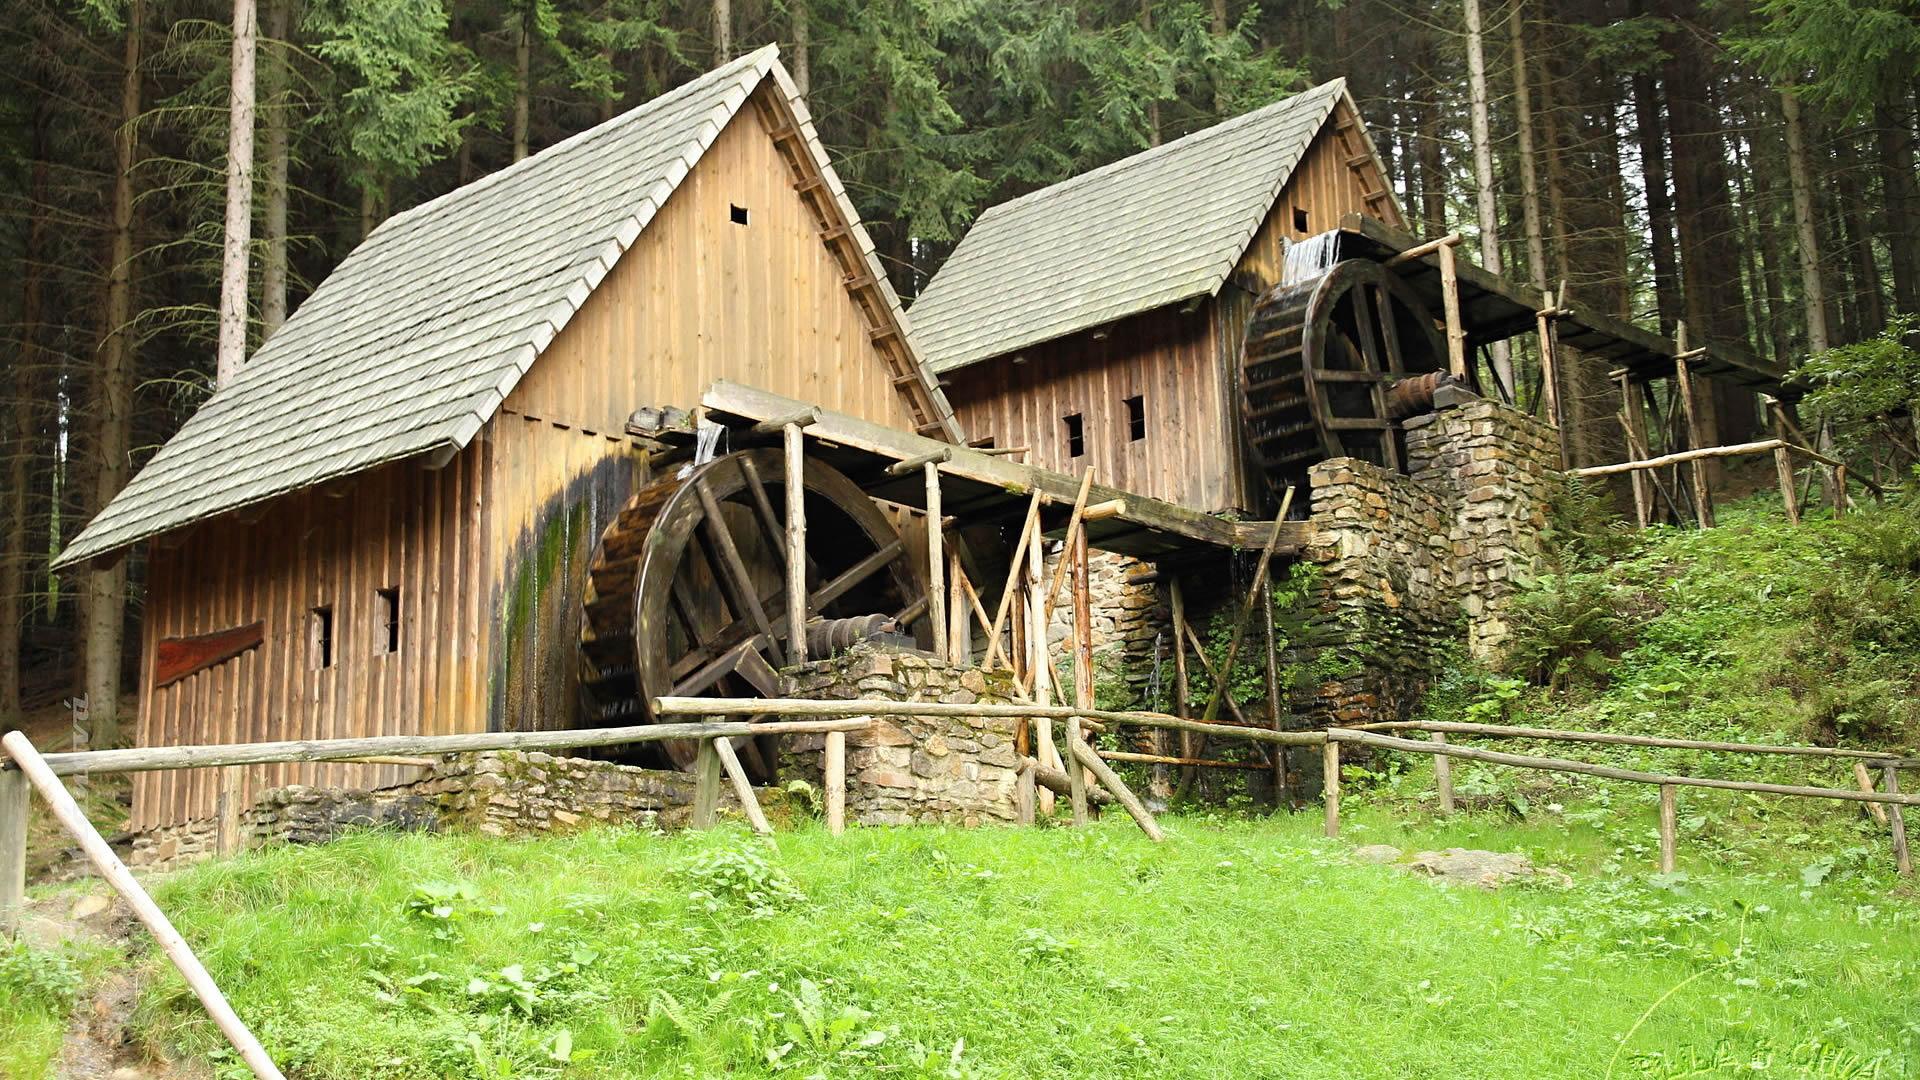 foto: Zlaté Hory – museum of gold panning